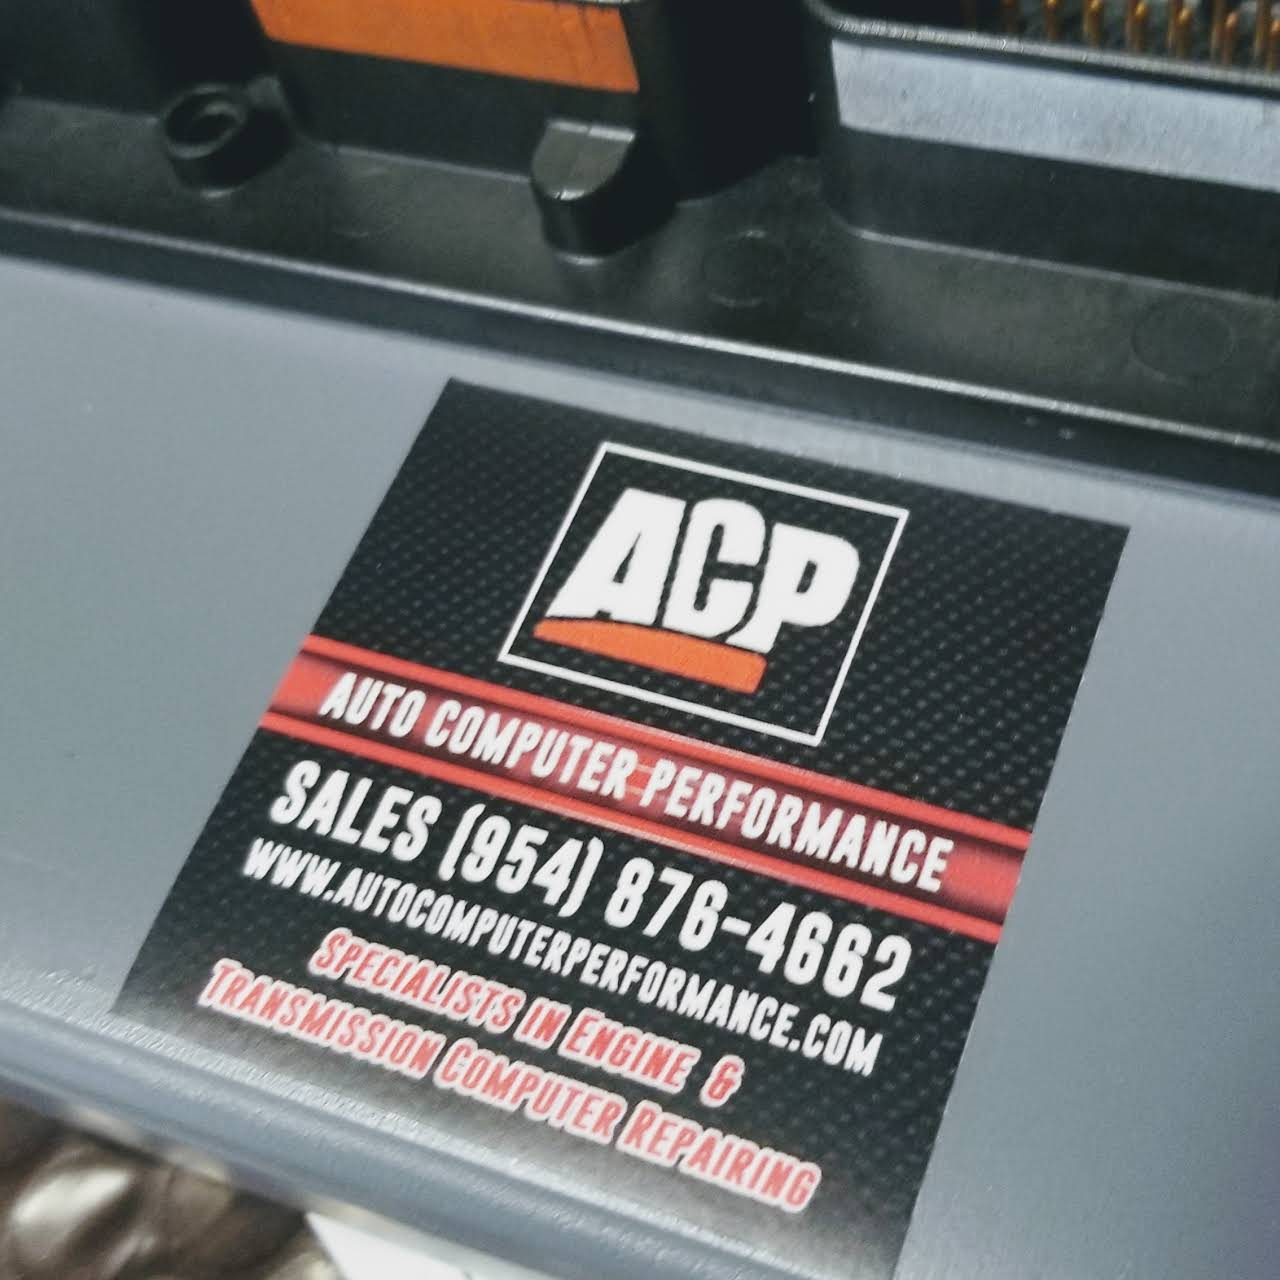 Auto Computer Performance - Engine computer remanufacture